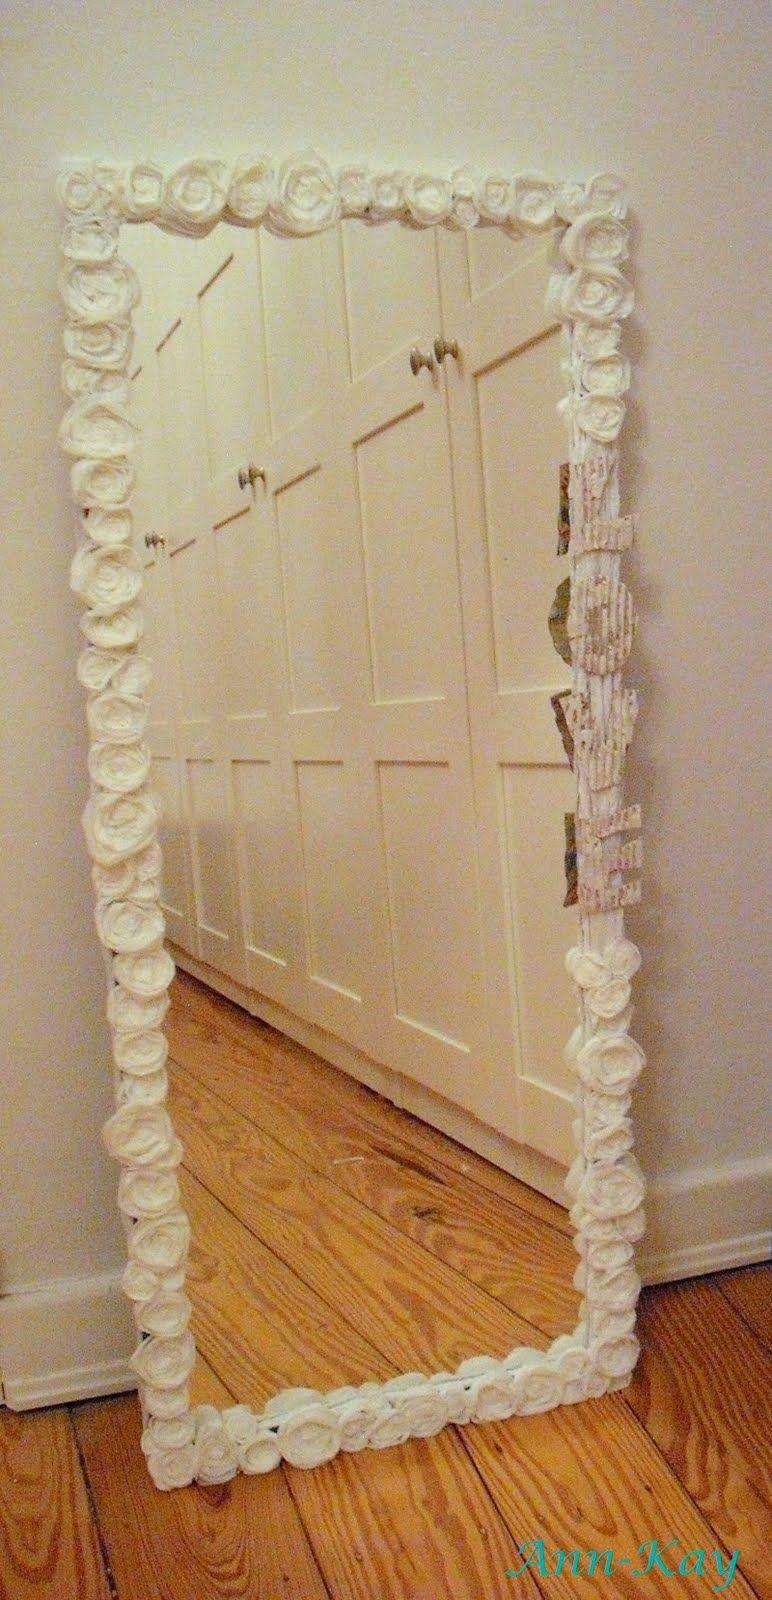 DIY: Easy Mirror Makeover $5.00 Walmart Mirror, Hobby Lobby Flowers ...